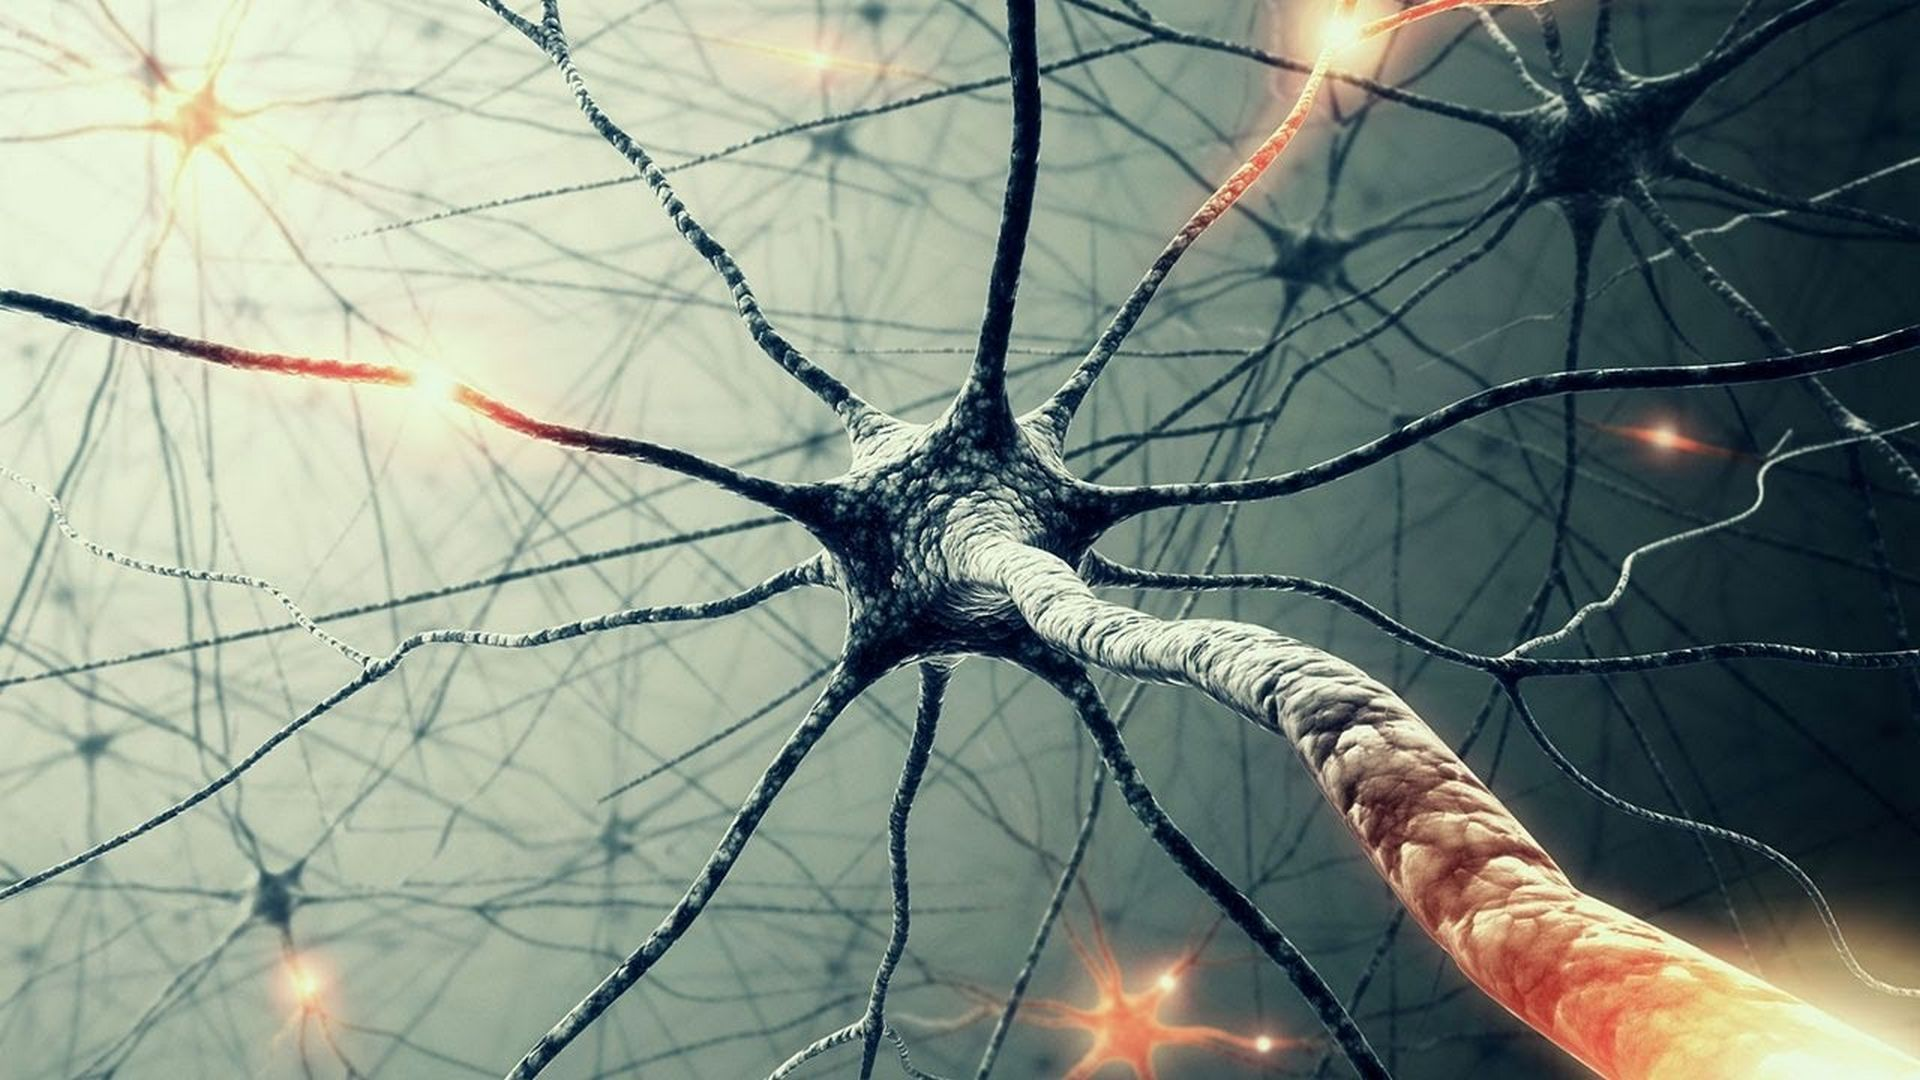 Microscopic Cells Hd Wallpaper Fullhdwpp Full Hd Wallpapers Esclerose Multipla Neuronios Sindrome Da Fadiga Cronica